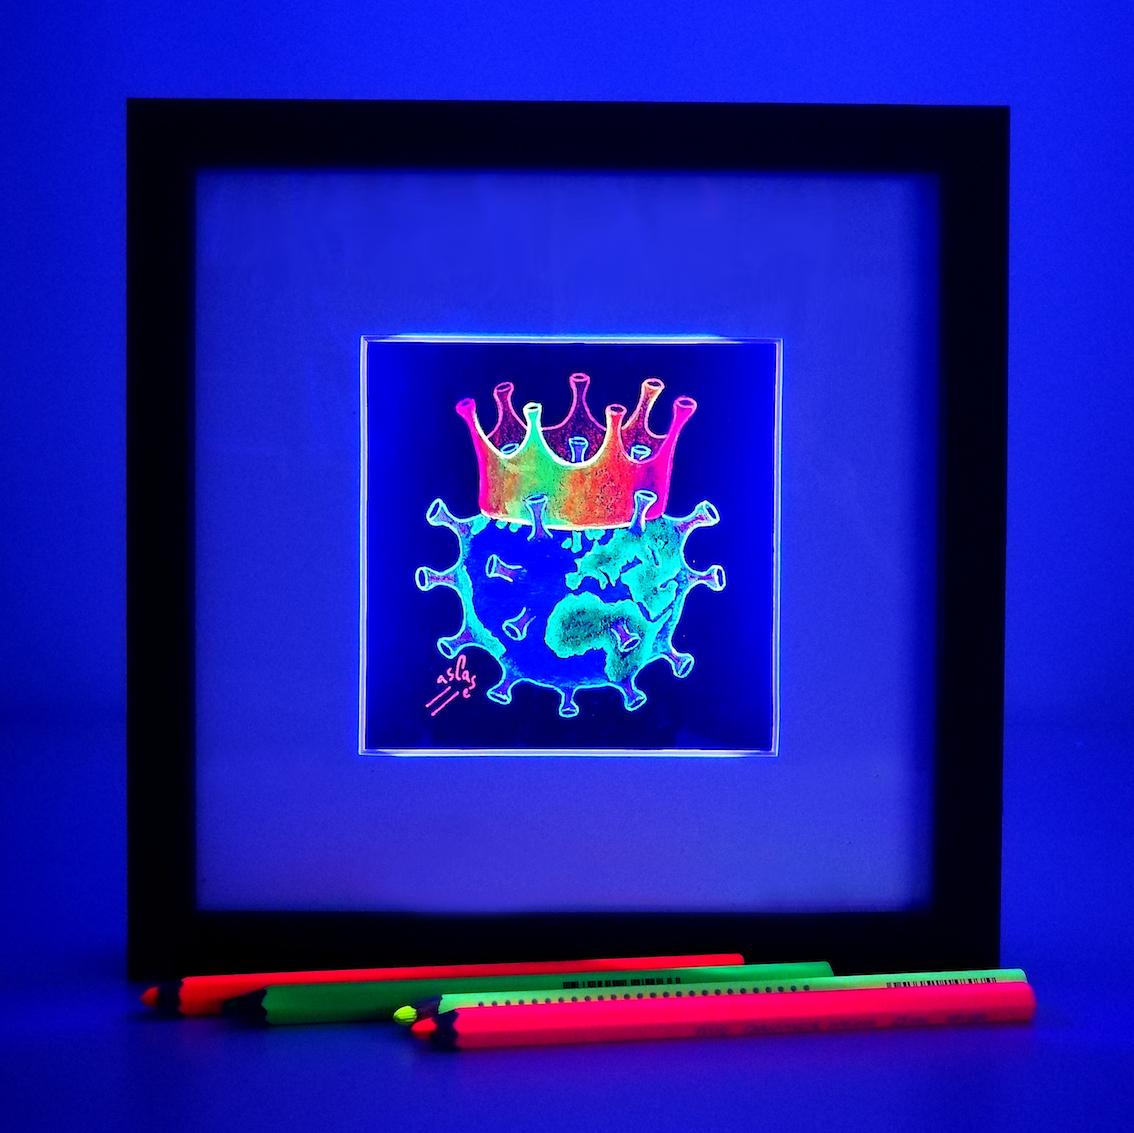 Coronavirus-fluorescente.-Ilustración-marco-led-luz-negra-uv.-Vicky-Casellas